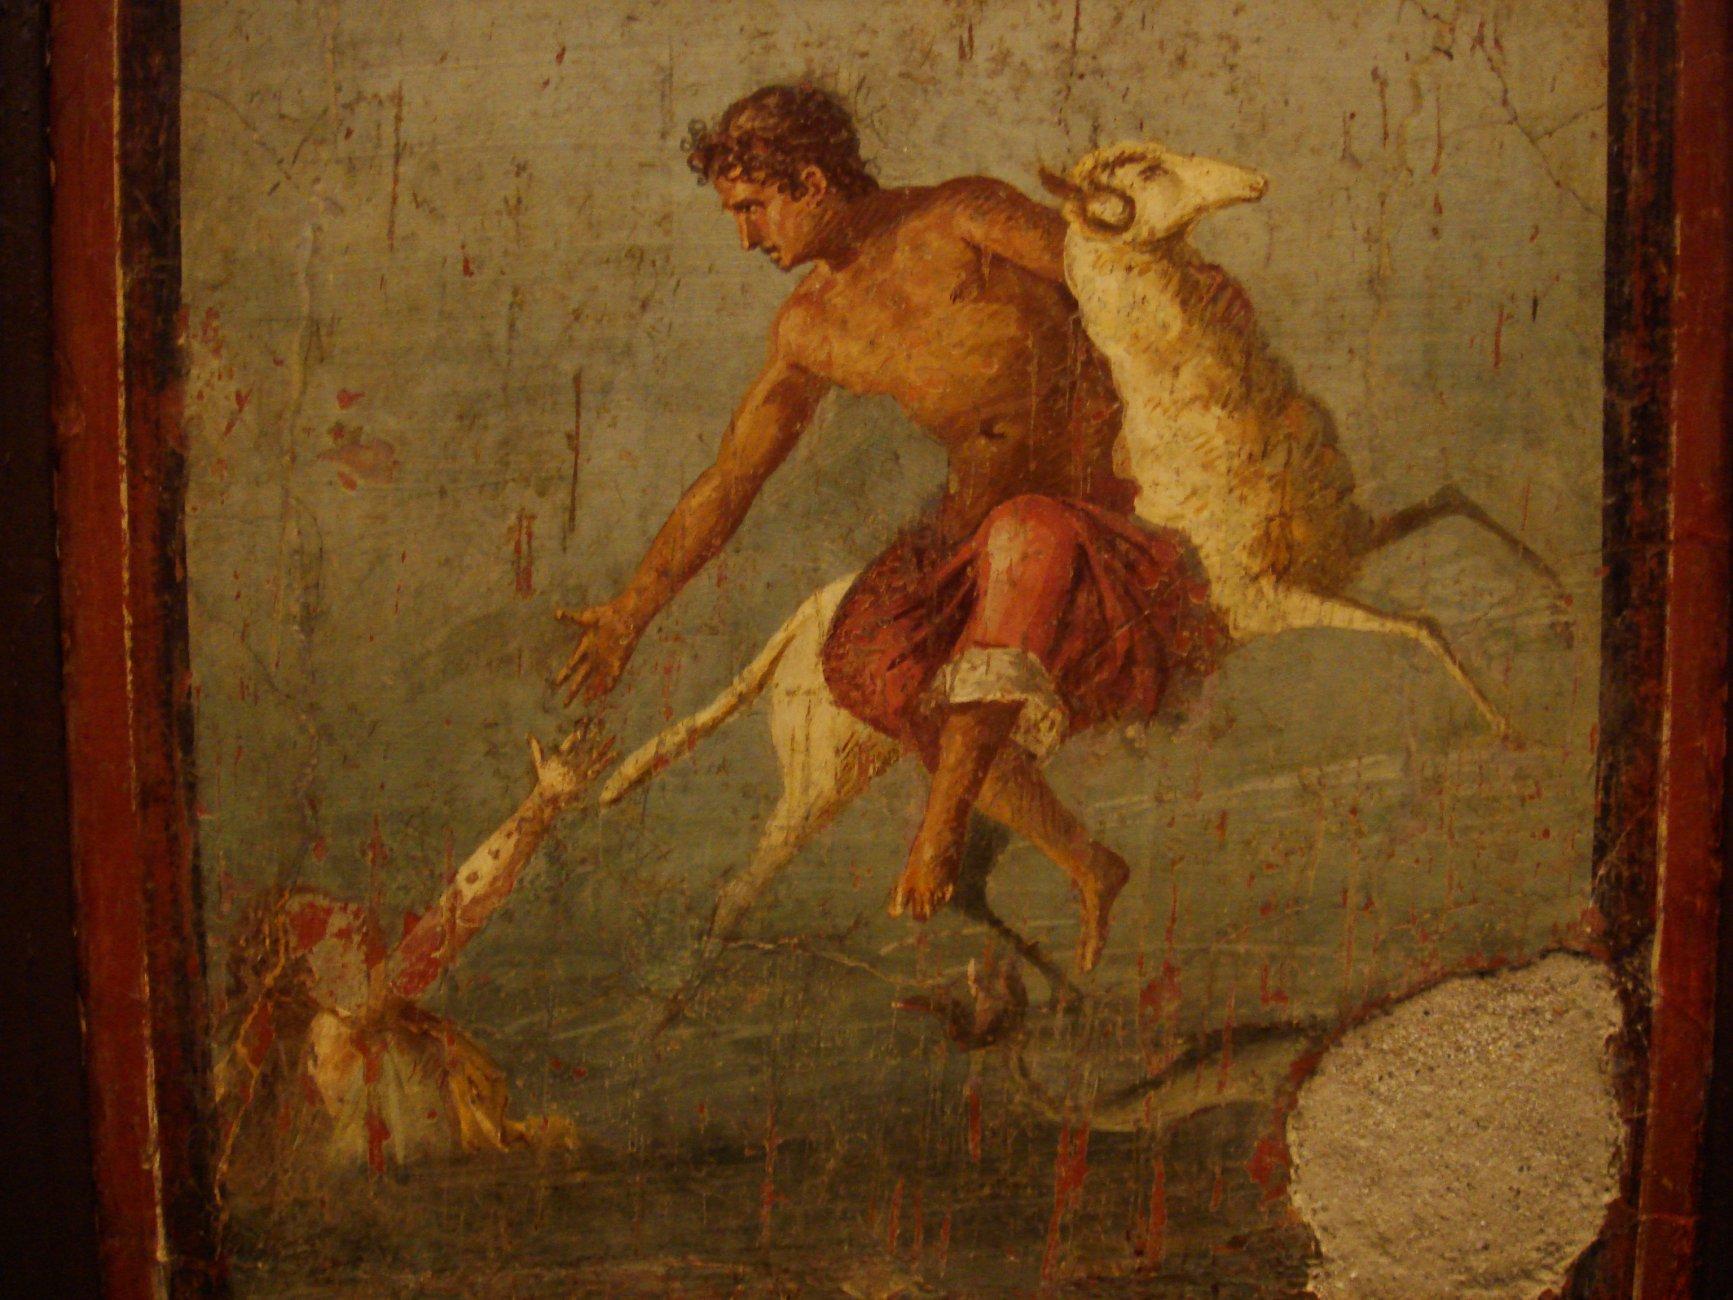 Affreschi_romani_-_Pompei_-_Frisso_ed_Elle.JPG